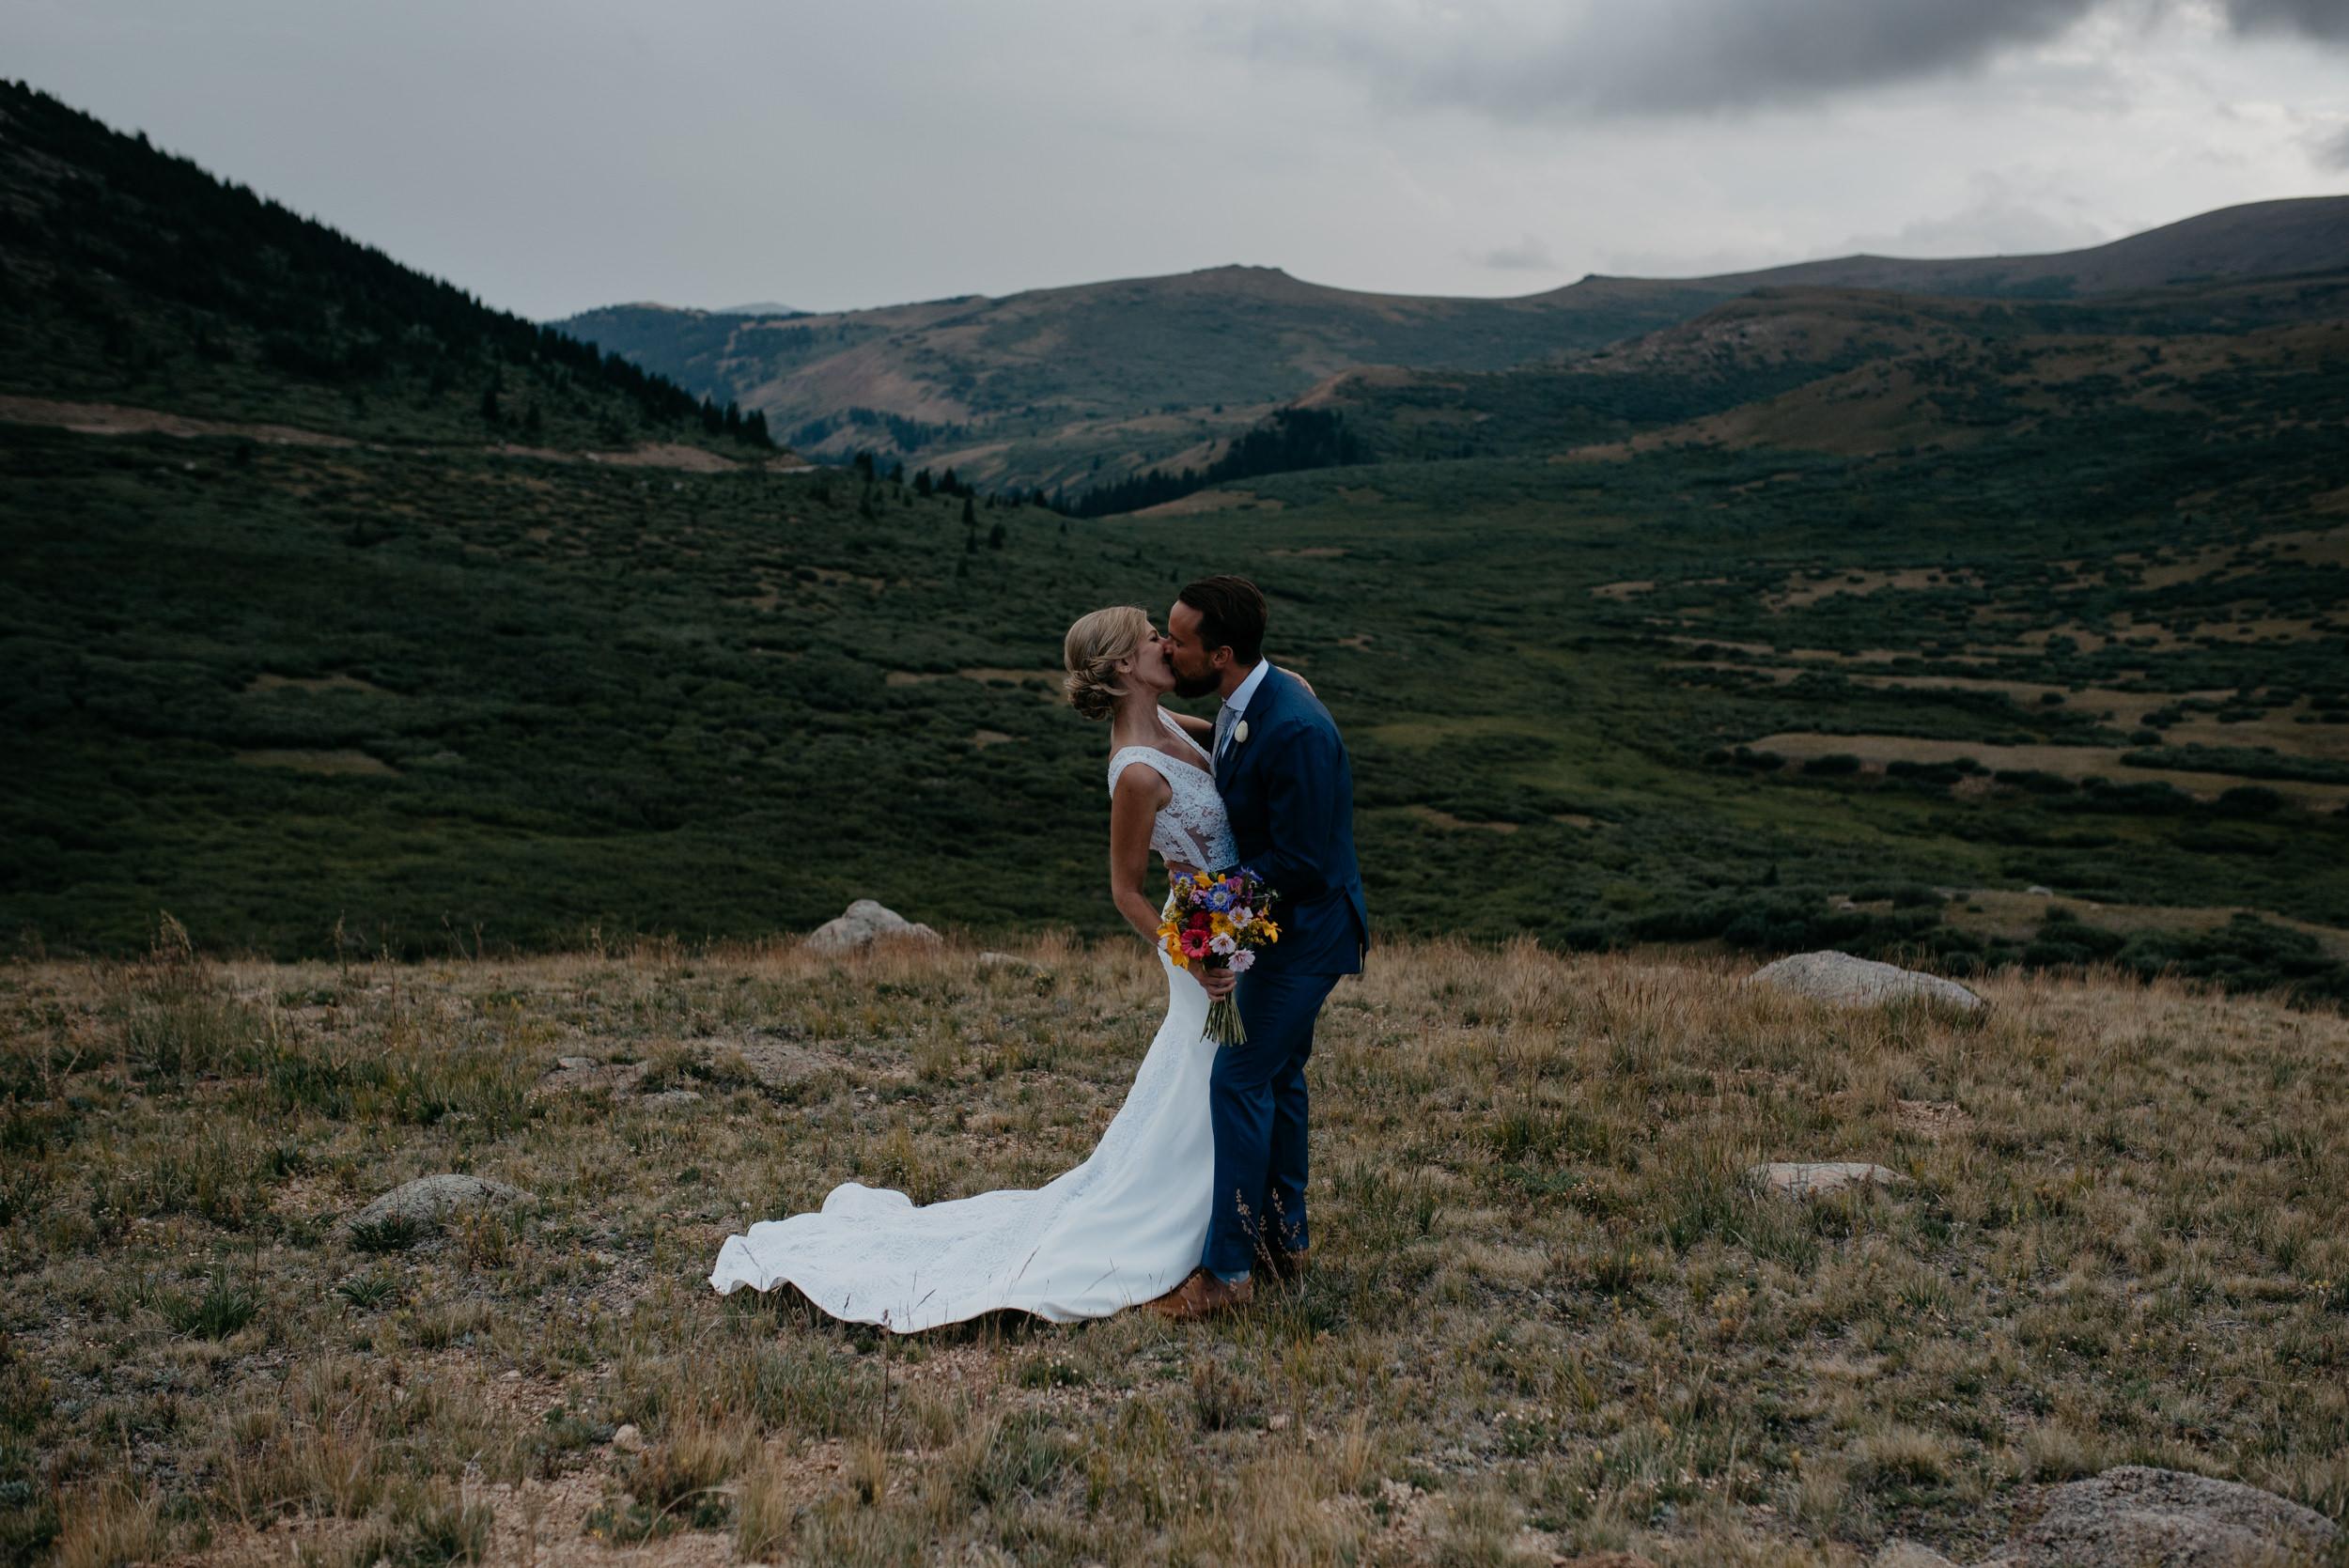 Kissing photo at a Guanella Pass elopement